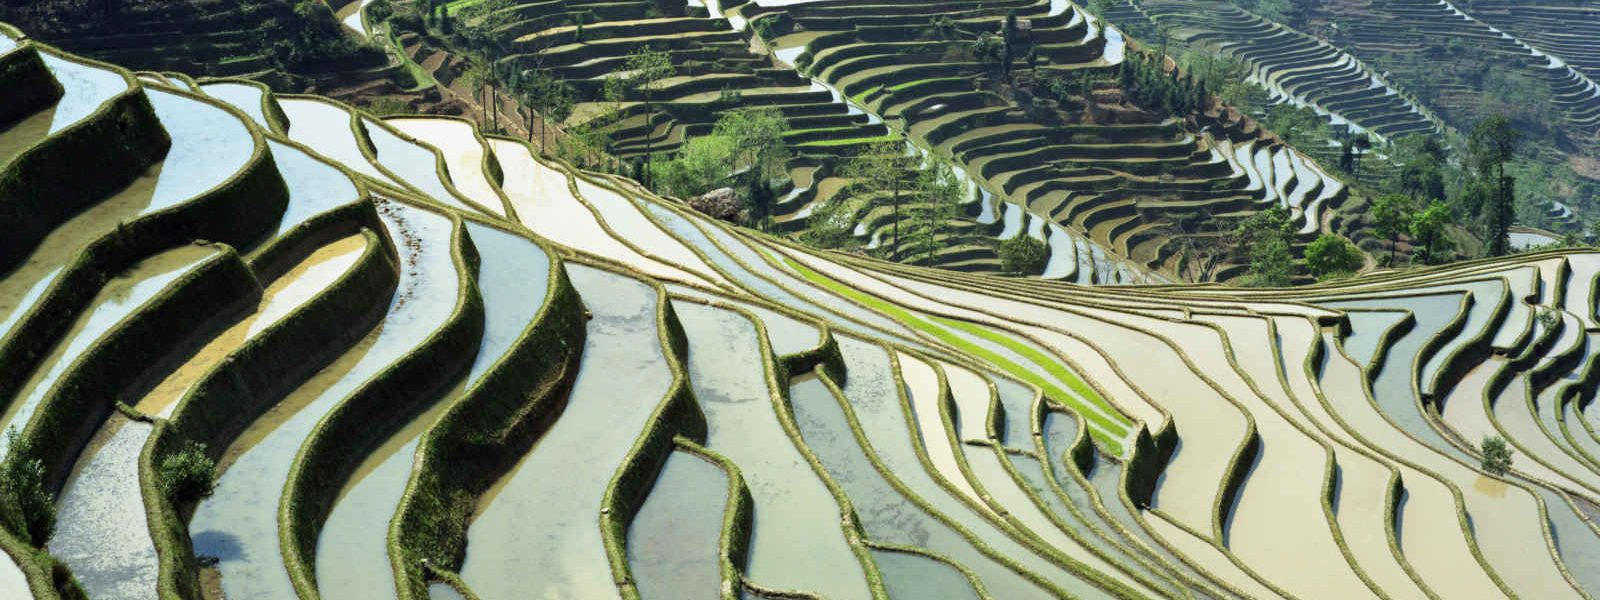 Rizières du Yunnan, Chine